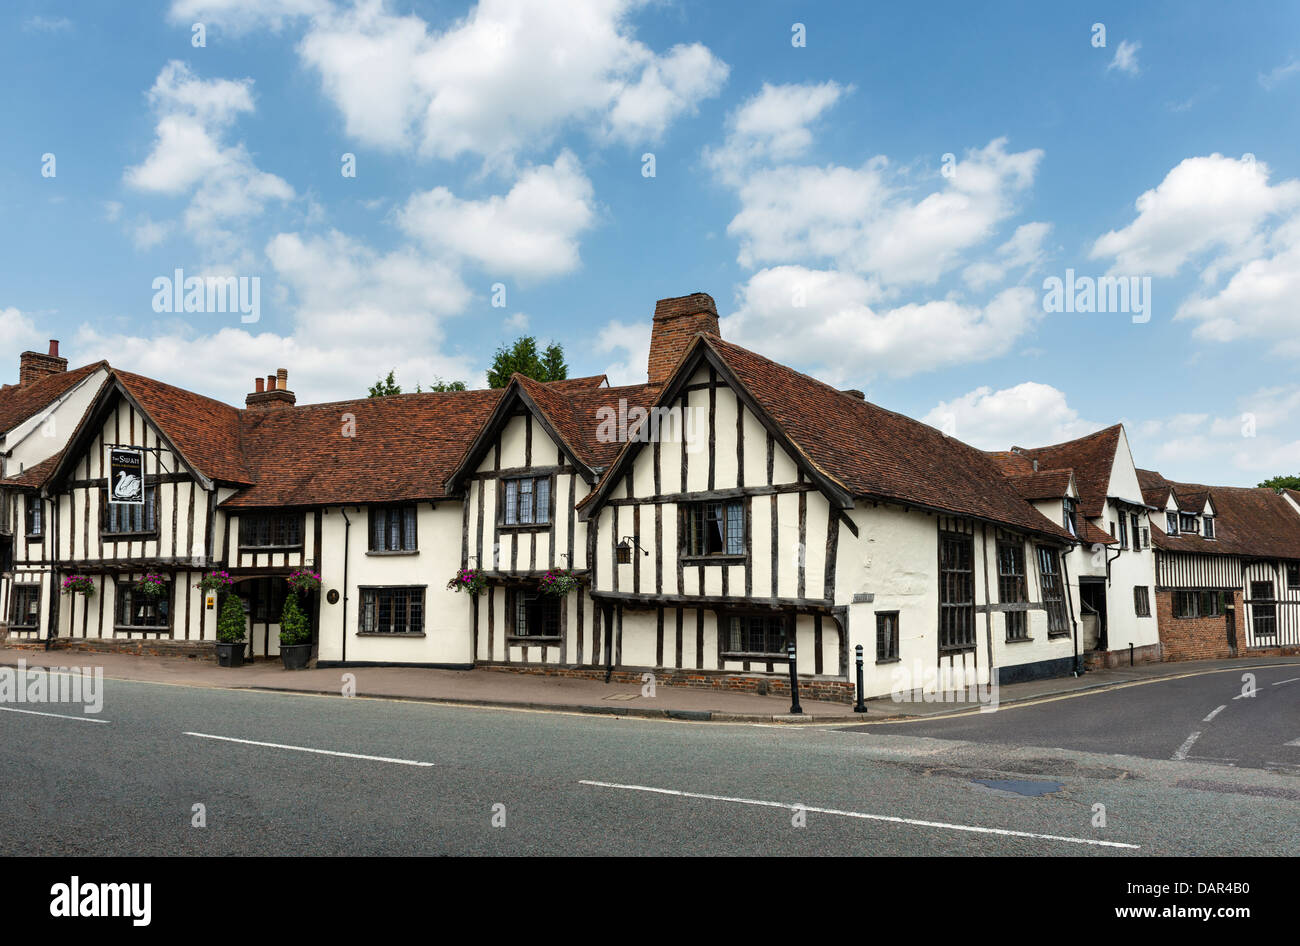 The Swan Lavenham - Stock Image